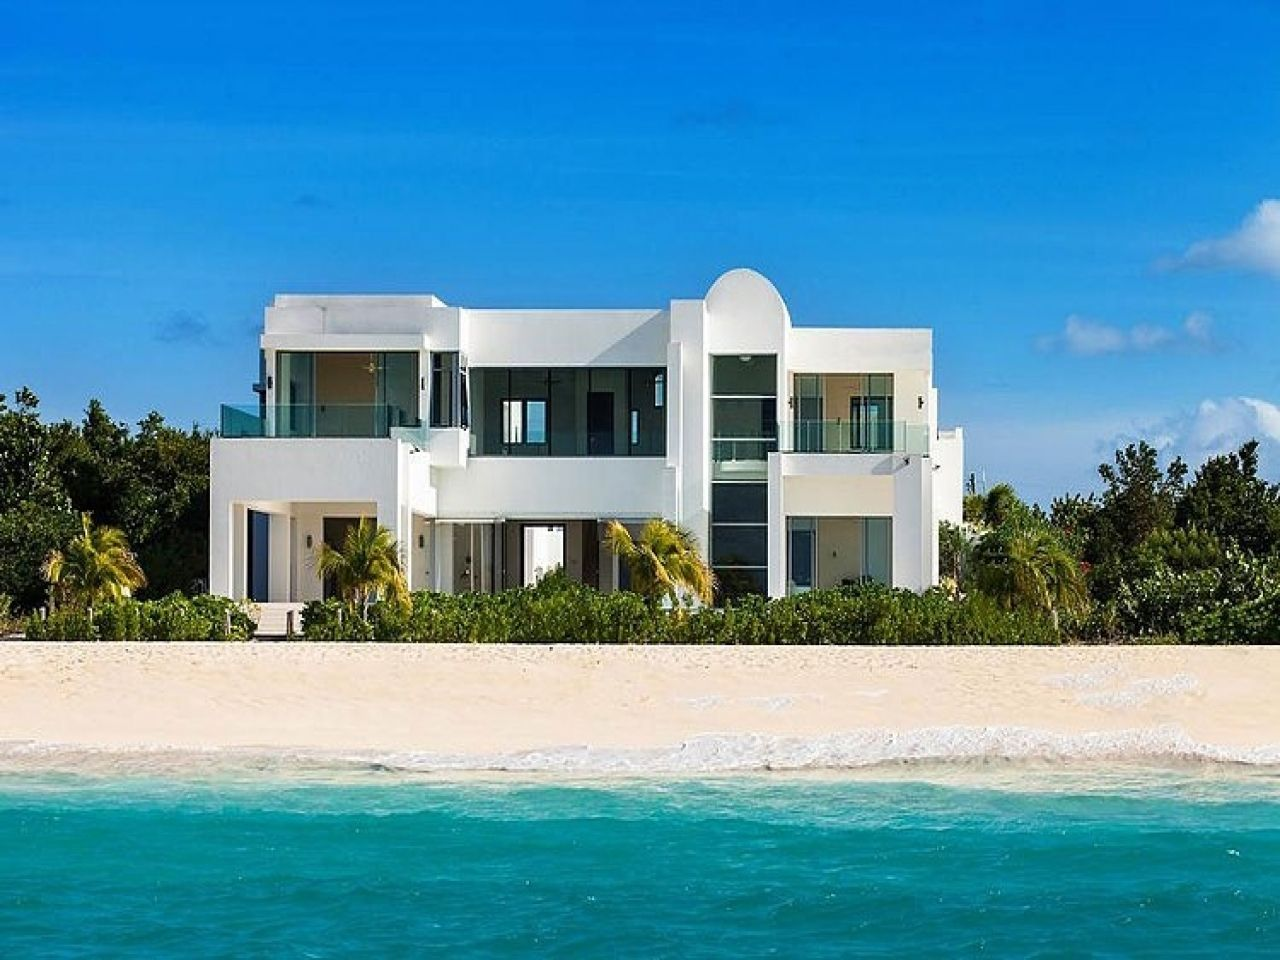 Beach Houses Caribbean House Designs Seaside Home Narrow Lot Plans